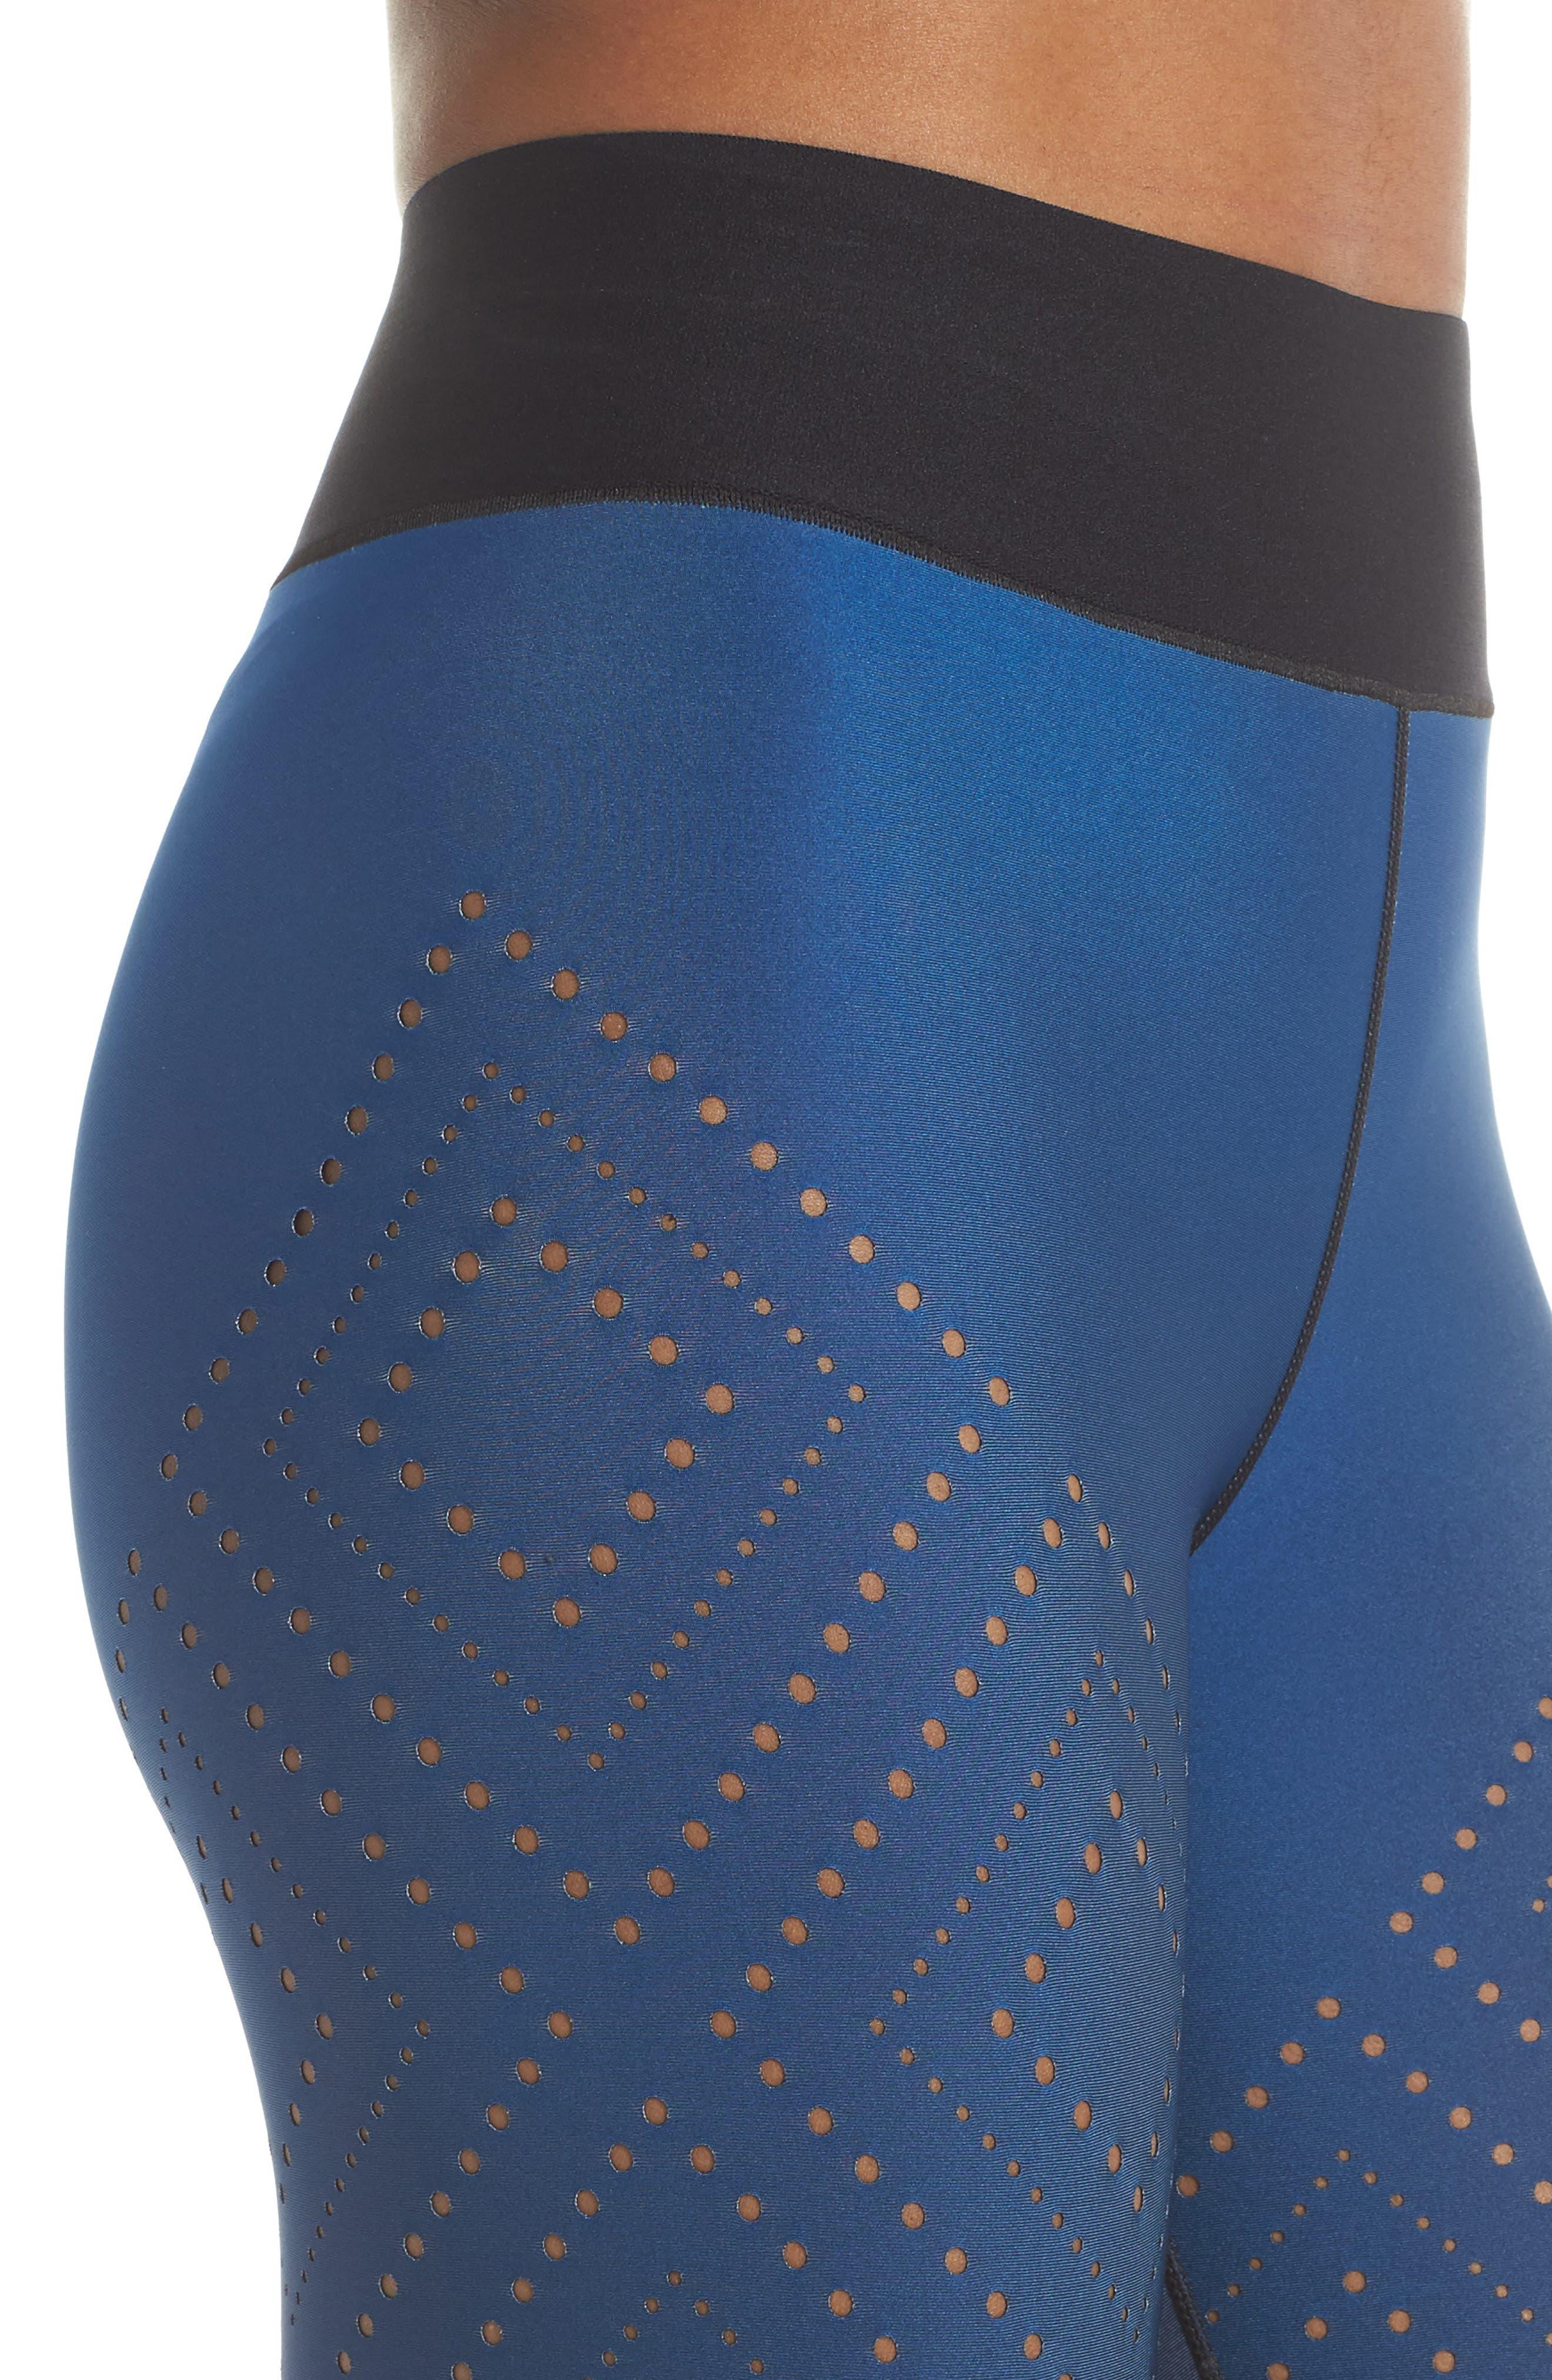 Sprinter High Argyle Pixelate Leggings,                             Alternate thumbnail 4, color,                             GRADIENT SAPPHIRE